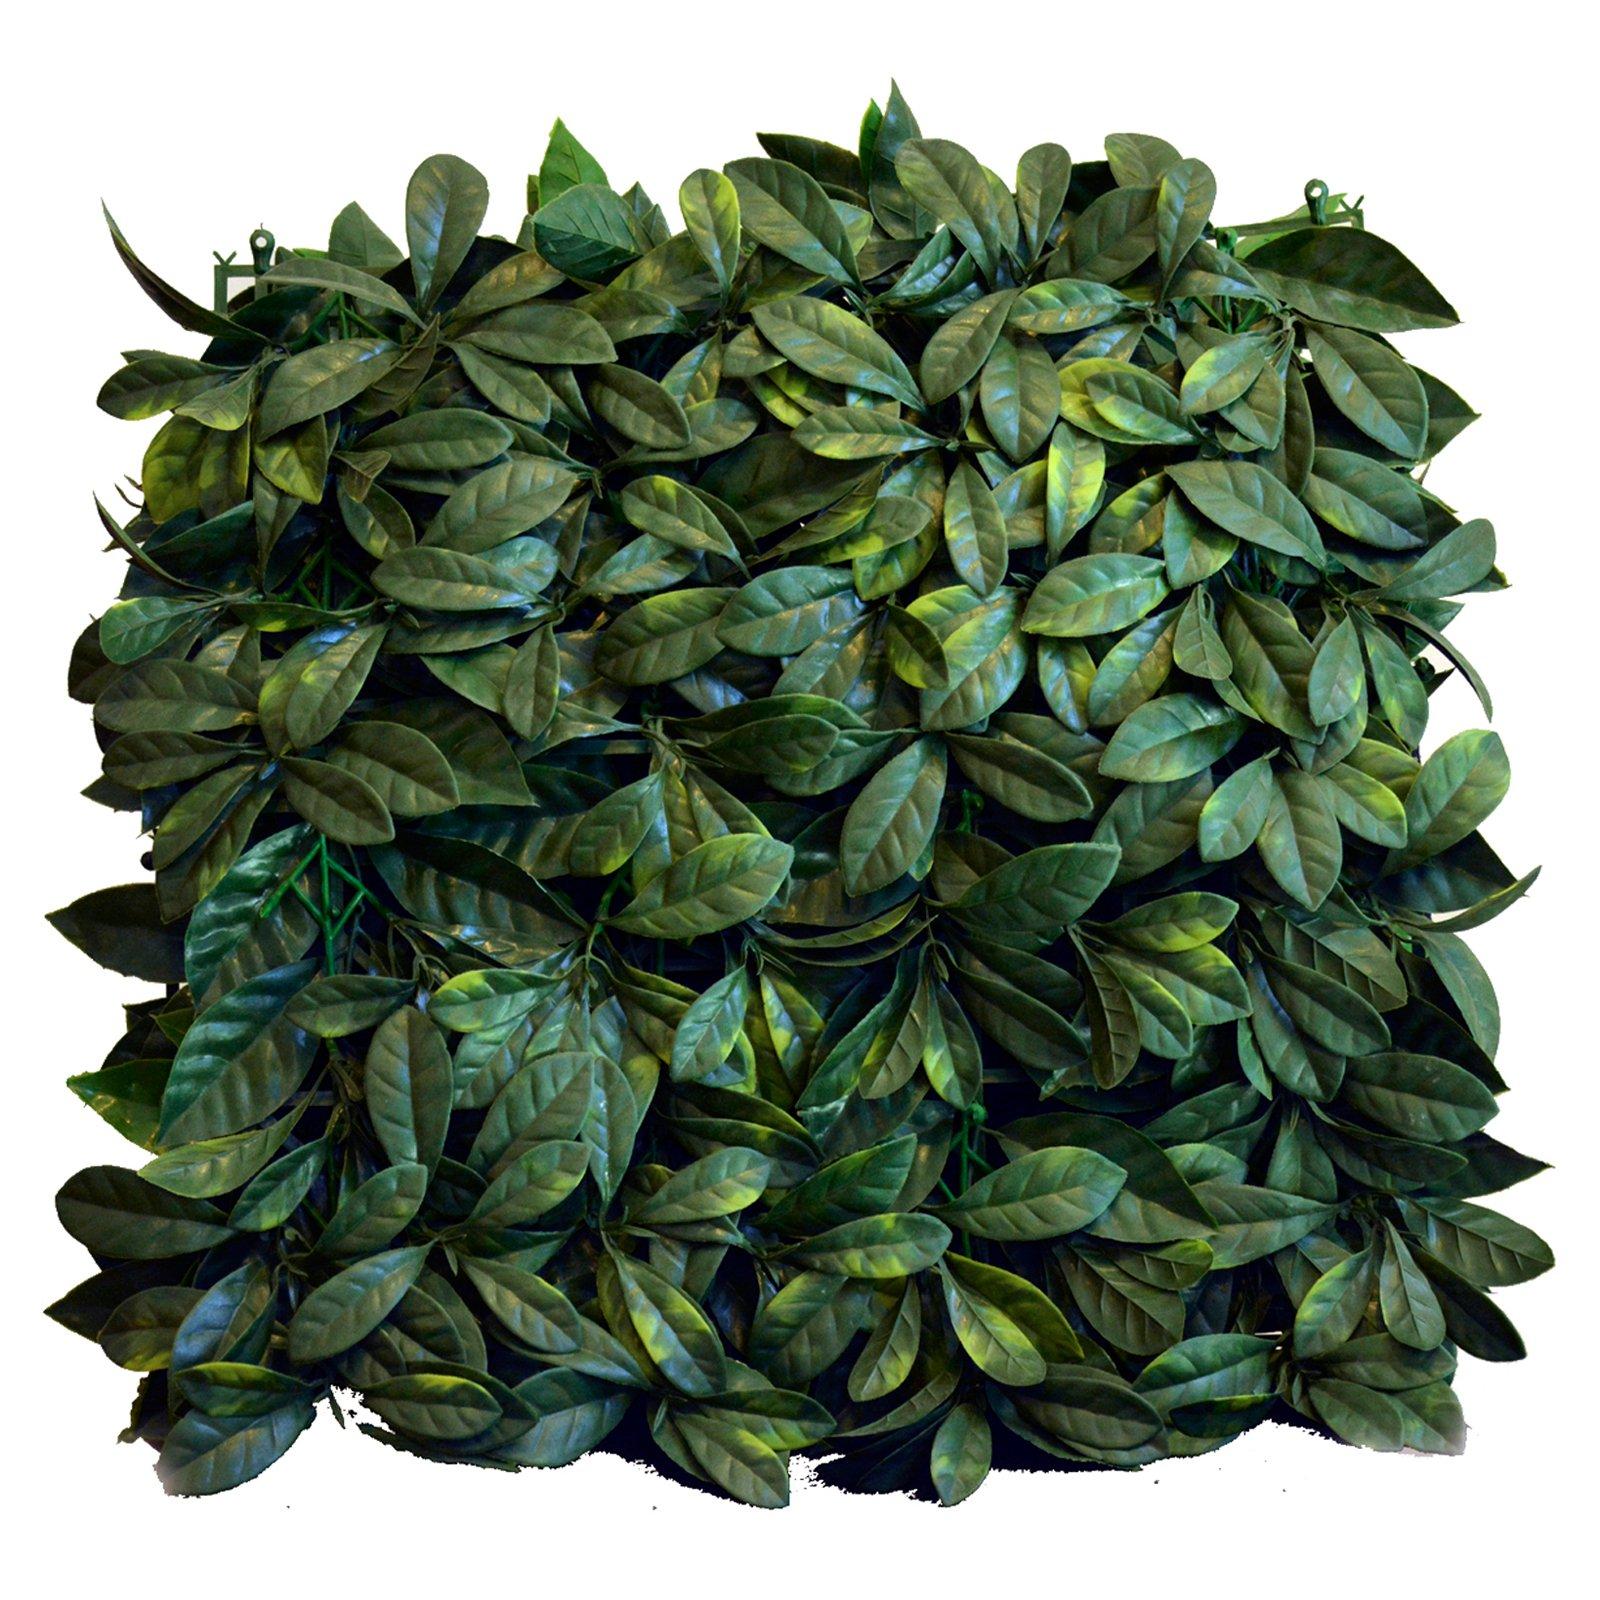 Greensmart Decor Artificial Greenery Lemon Leaf Wall Panels - Set of 4